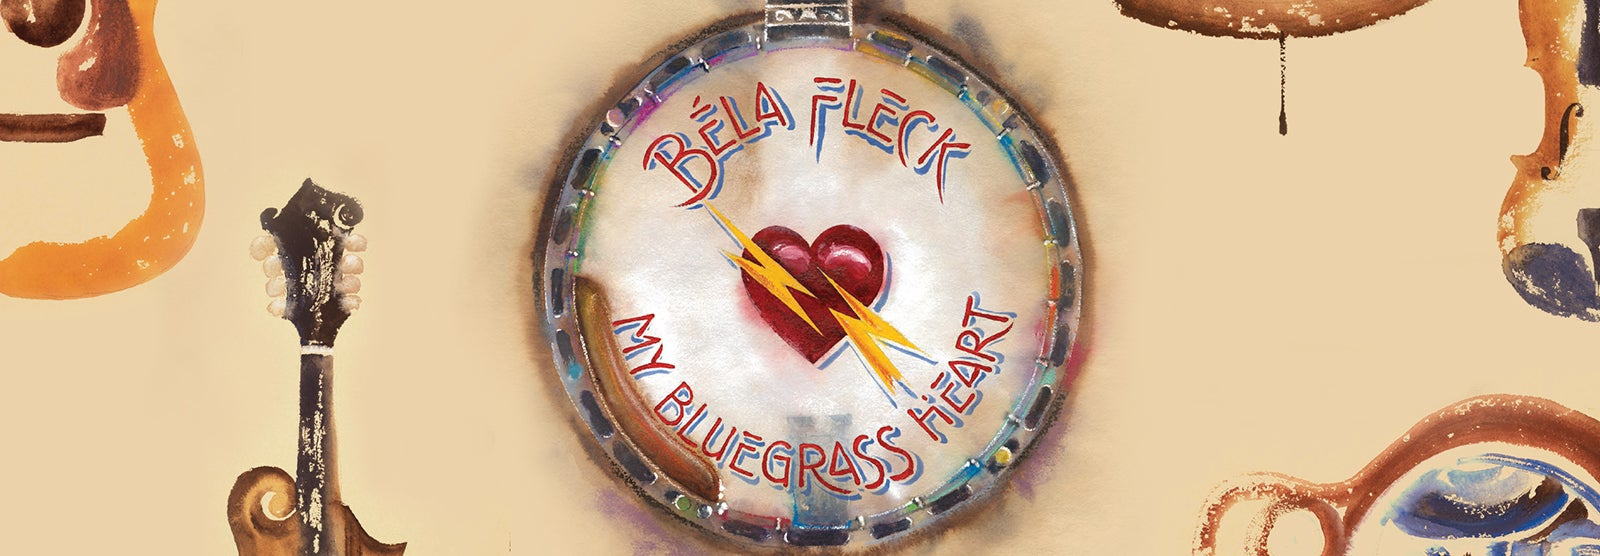 Béla Fleck My Bluegrass Heart